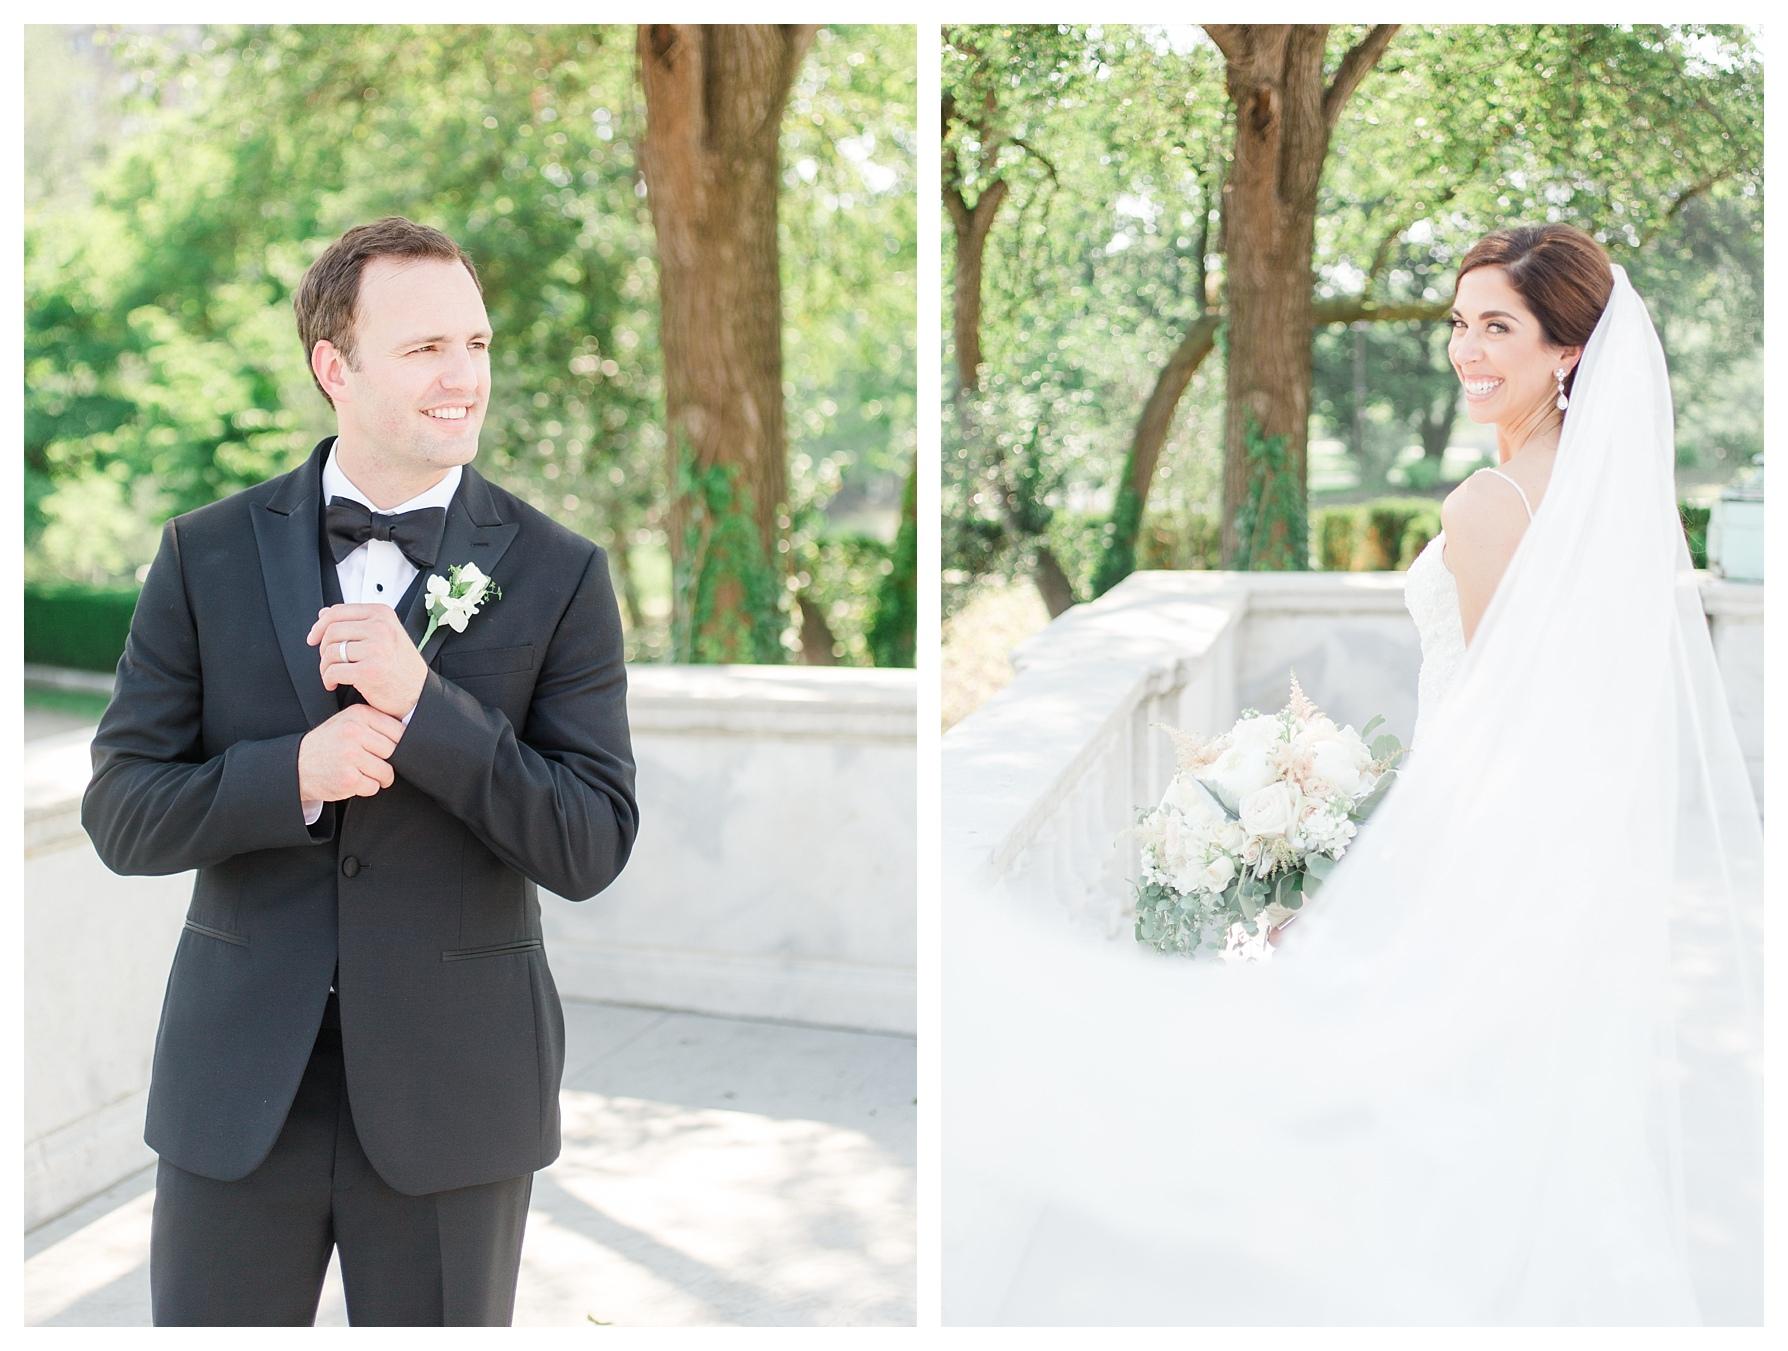 ritz-carlton-cleveland-wedding_0058.jpg